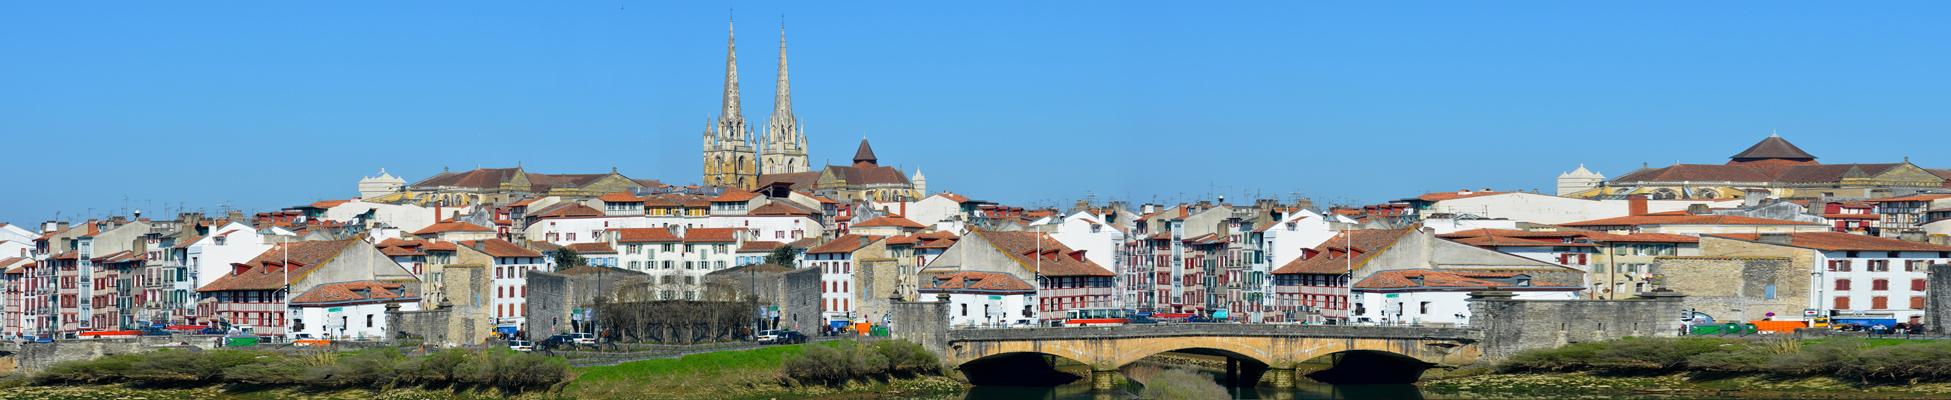 expert-comptable-lons-bayonne-jca-expert-pyrenees-atlantiques-64-aquitaine-visuel2